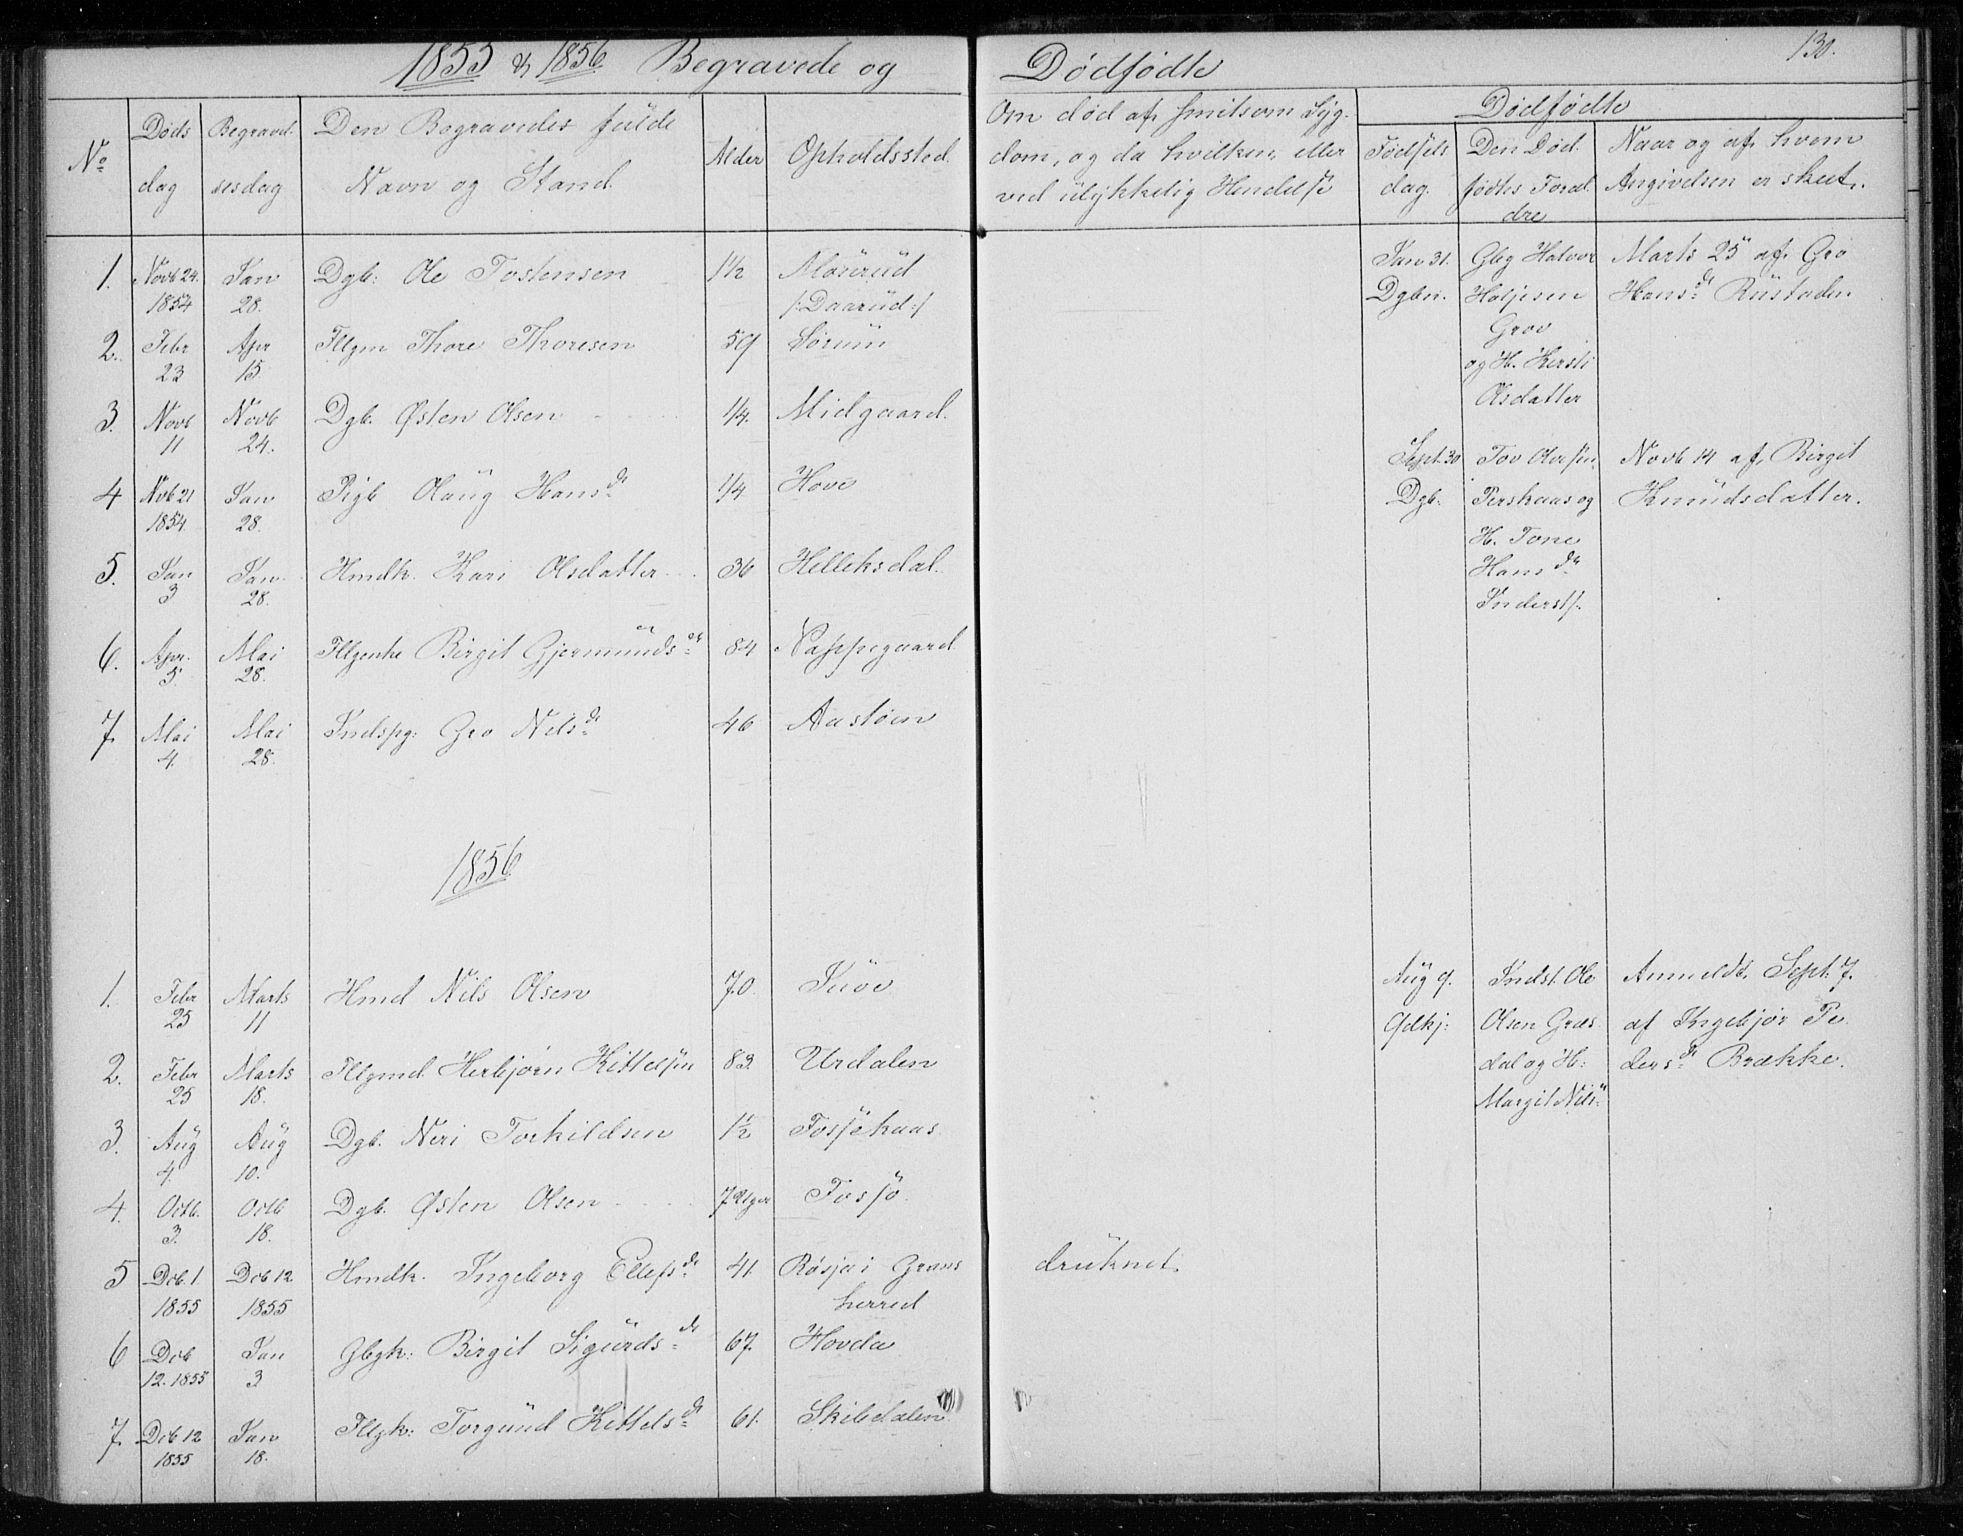 SAKO, Gransherad kirkebøker, F/Fb/L0003: Ministerialbok nr. II 3, 1844-1859, s. 130